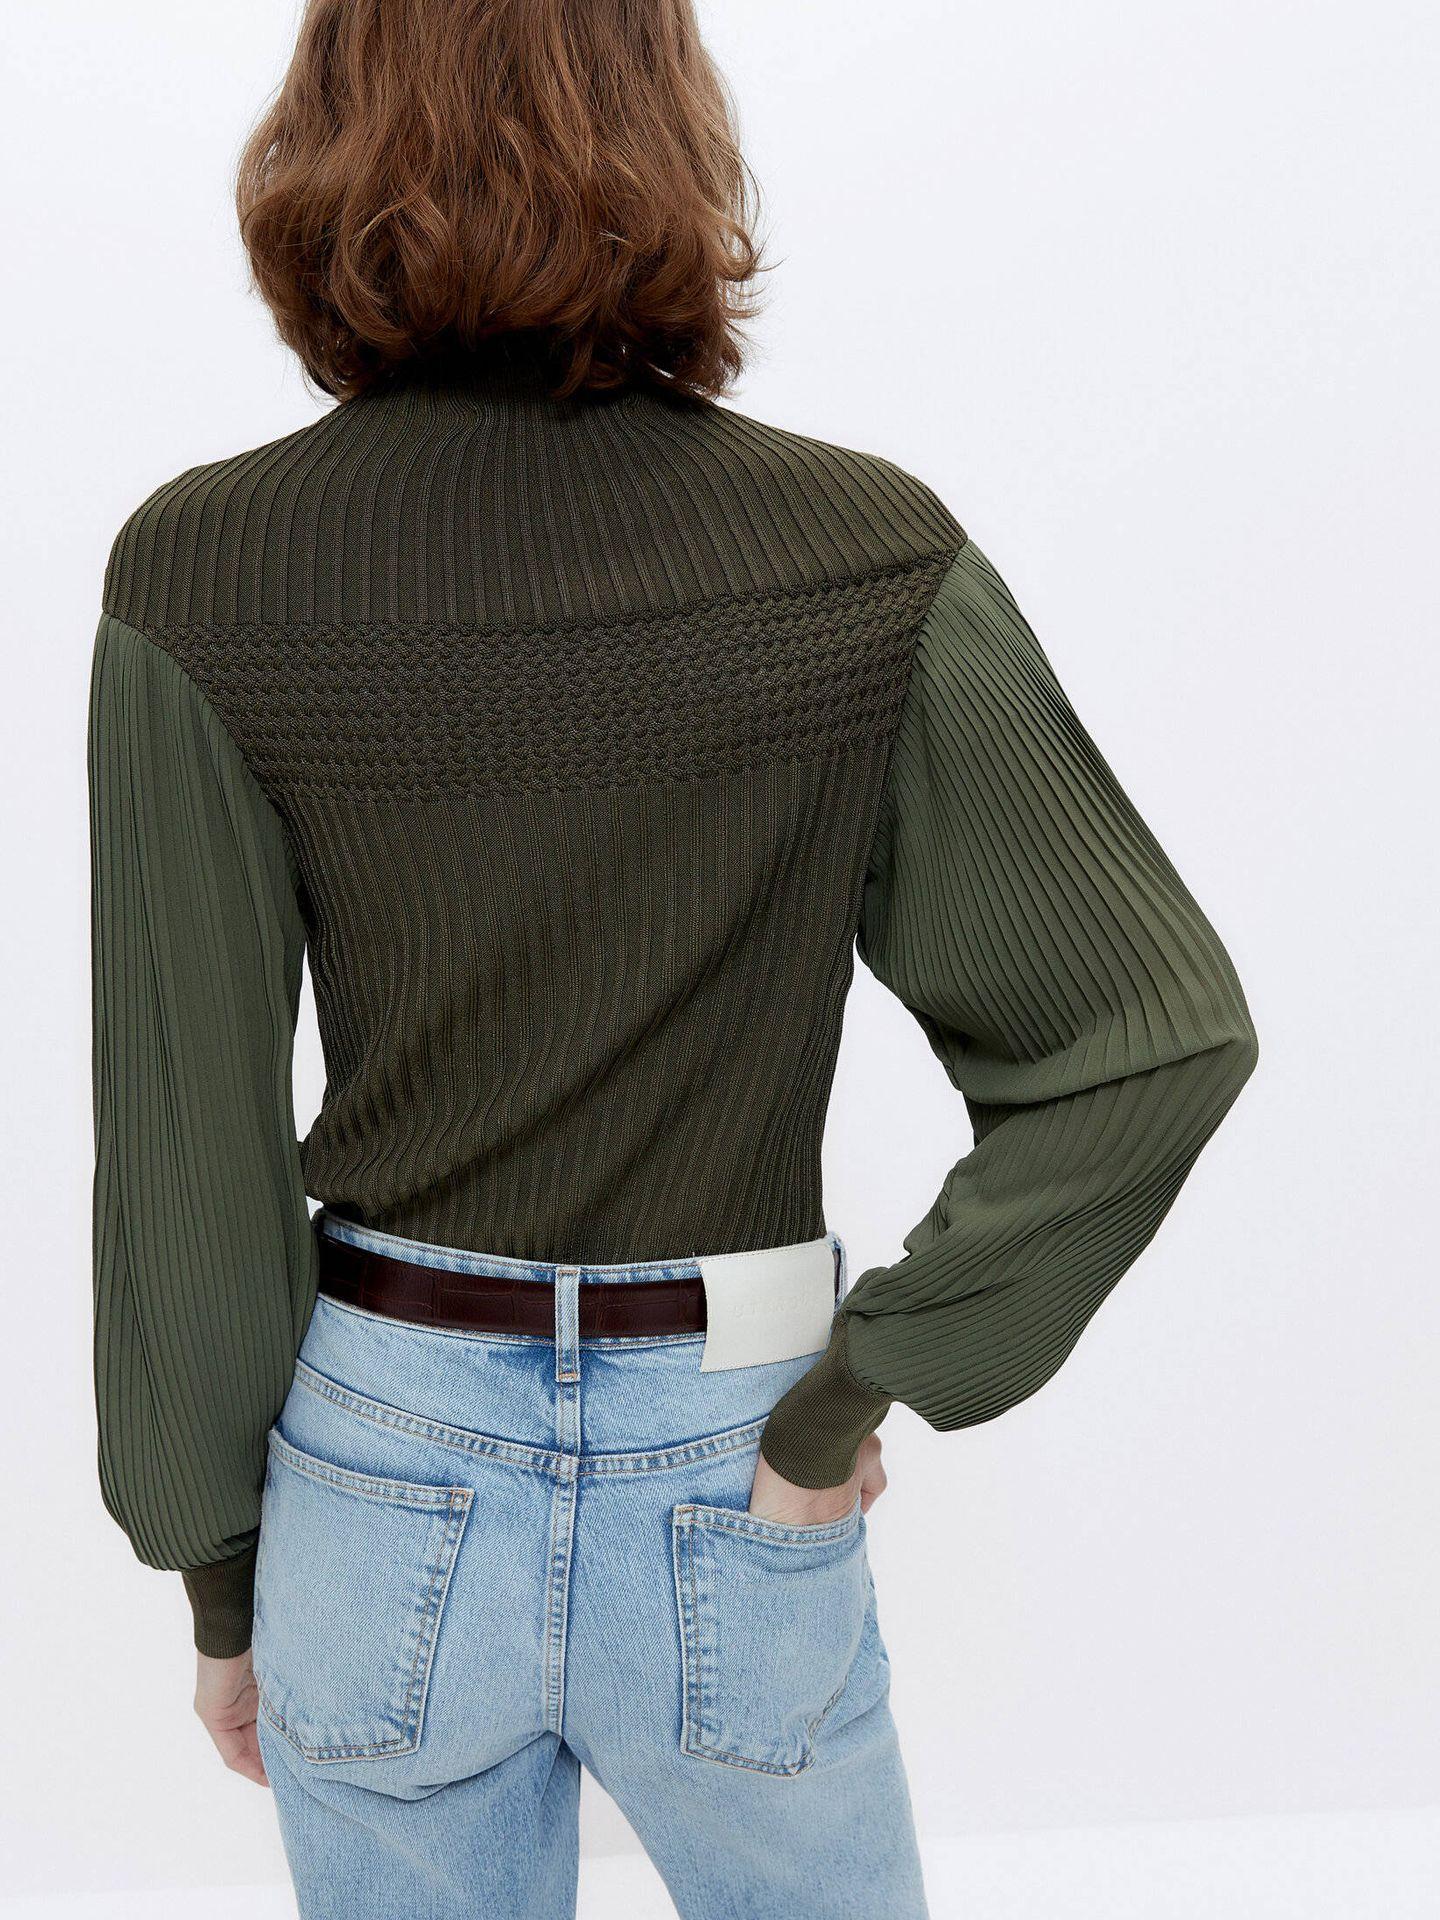 Jersey de manga plisada de Uterqüe. (Cortesía)